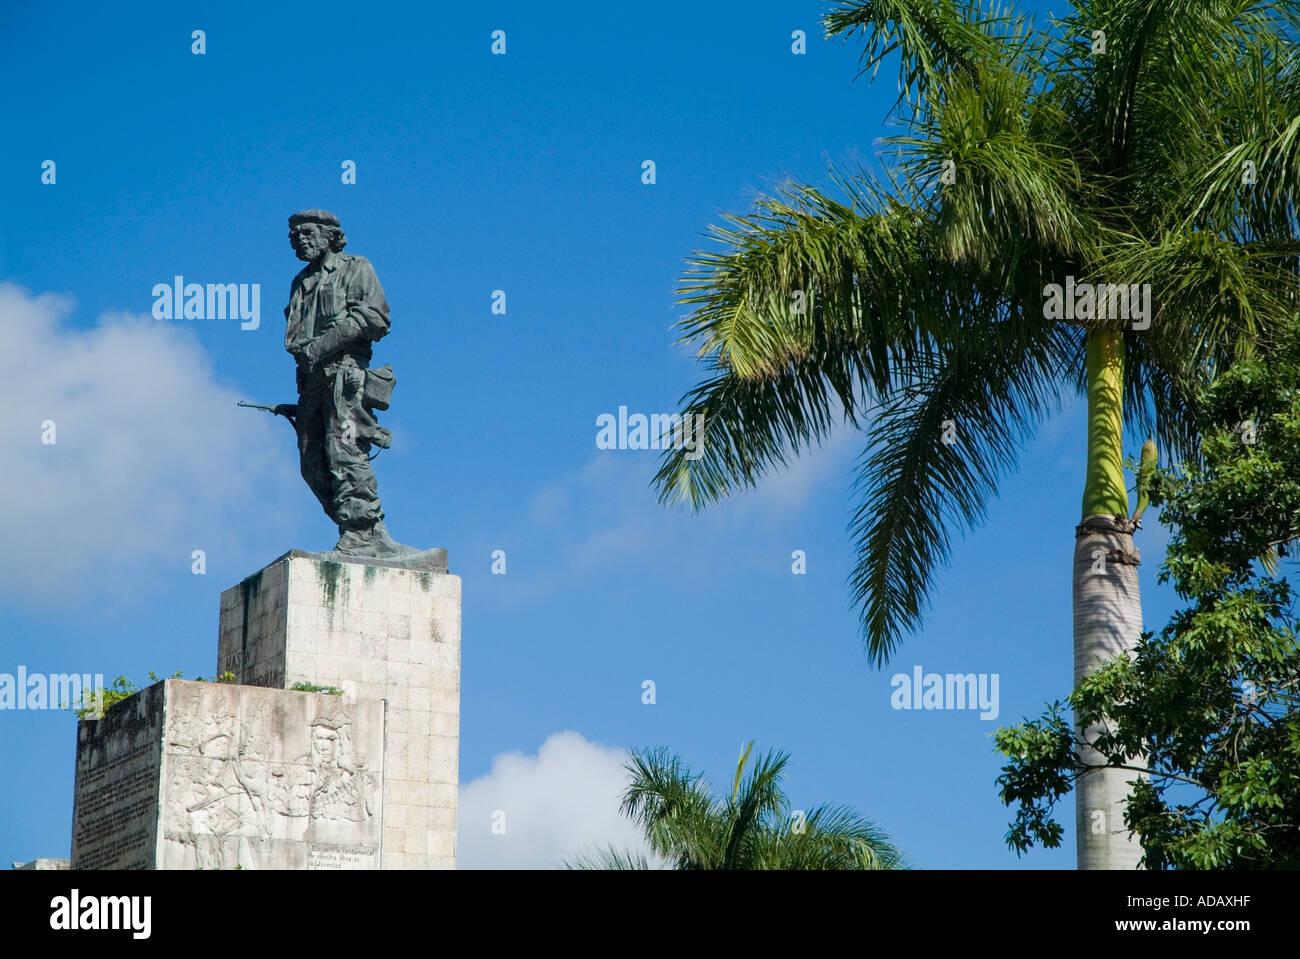 Che-Guevara-Denkmal auf der Plaza De La Revolucion, Santa Clara, Villa Clara, Kuba. Stockbild